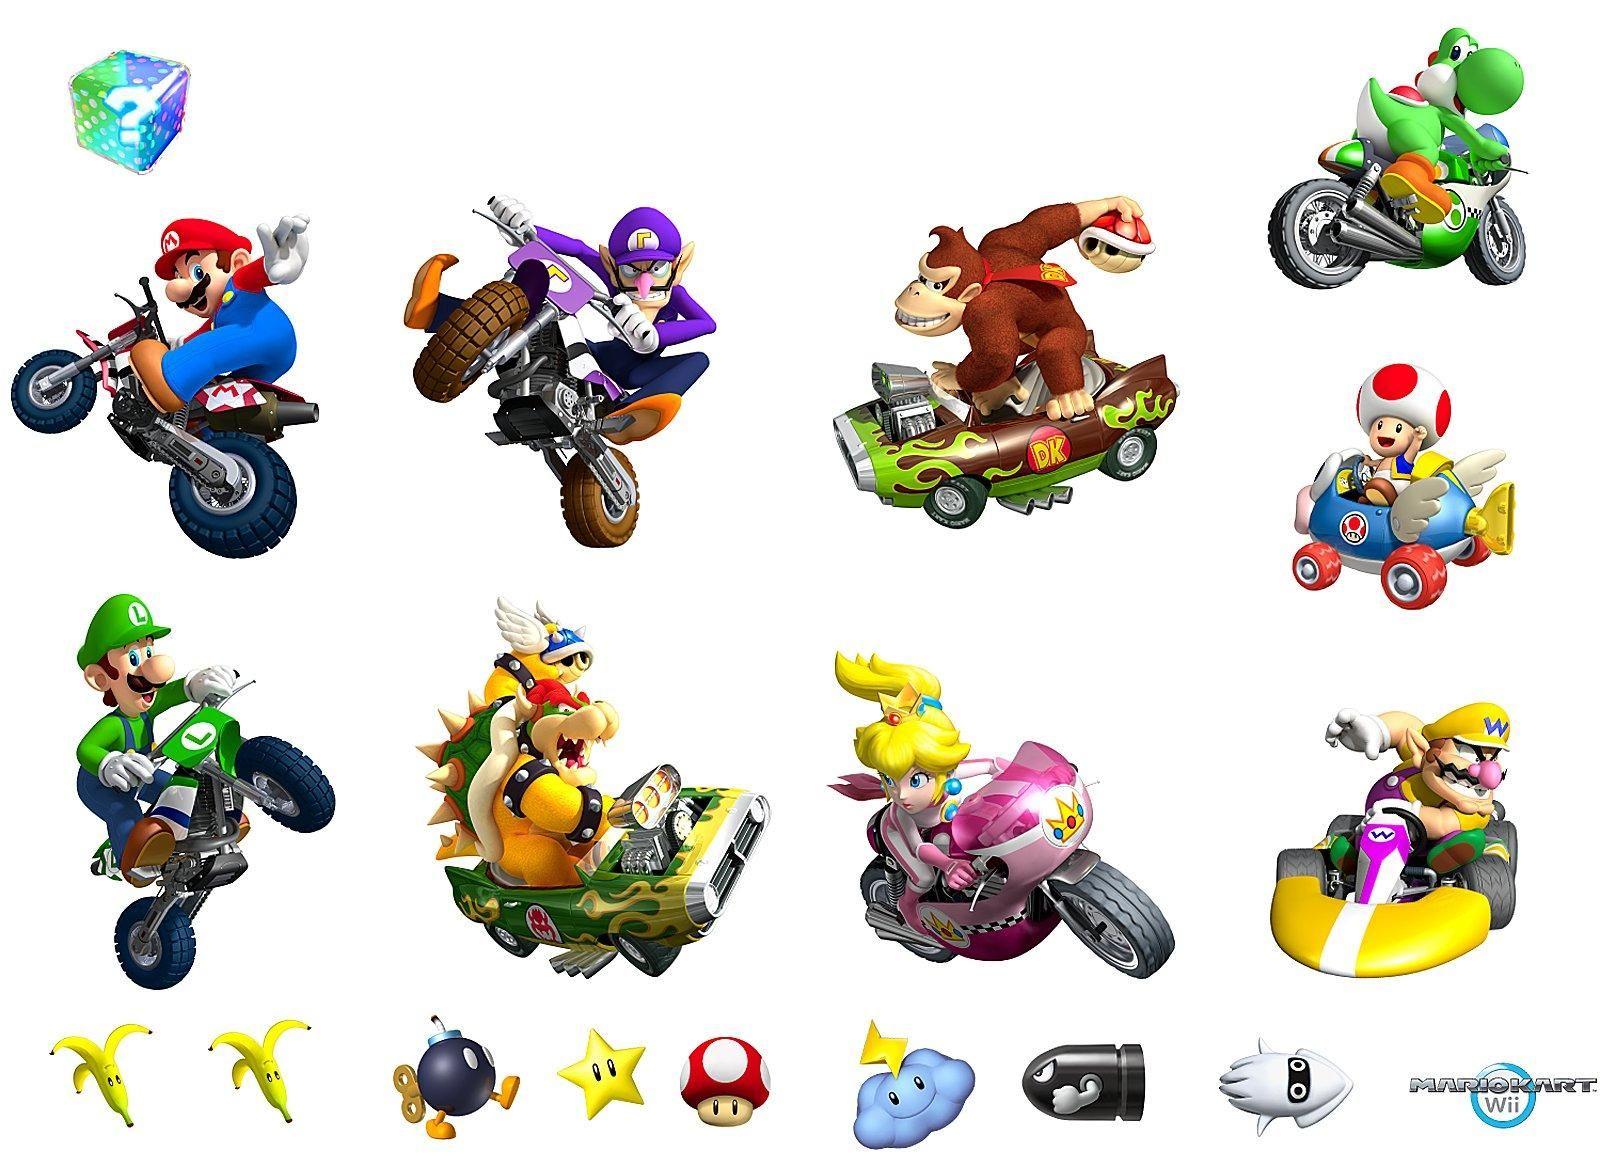 Donkey kong mario kart wii car tuning - Mario Kart Wii Removable Wall Decorations